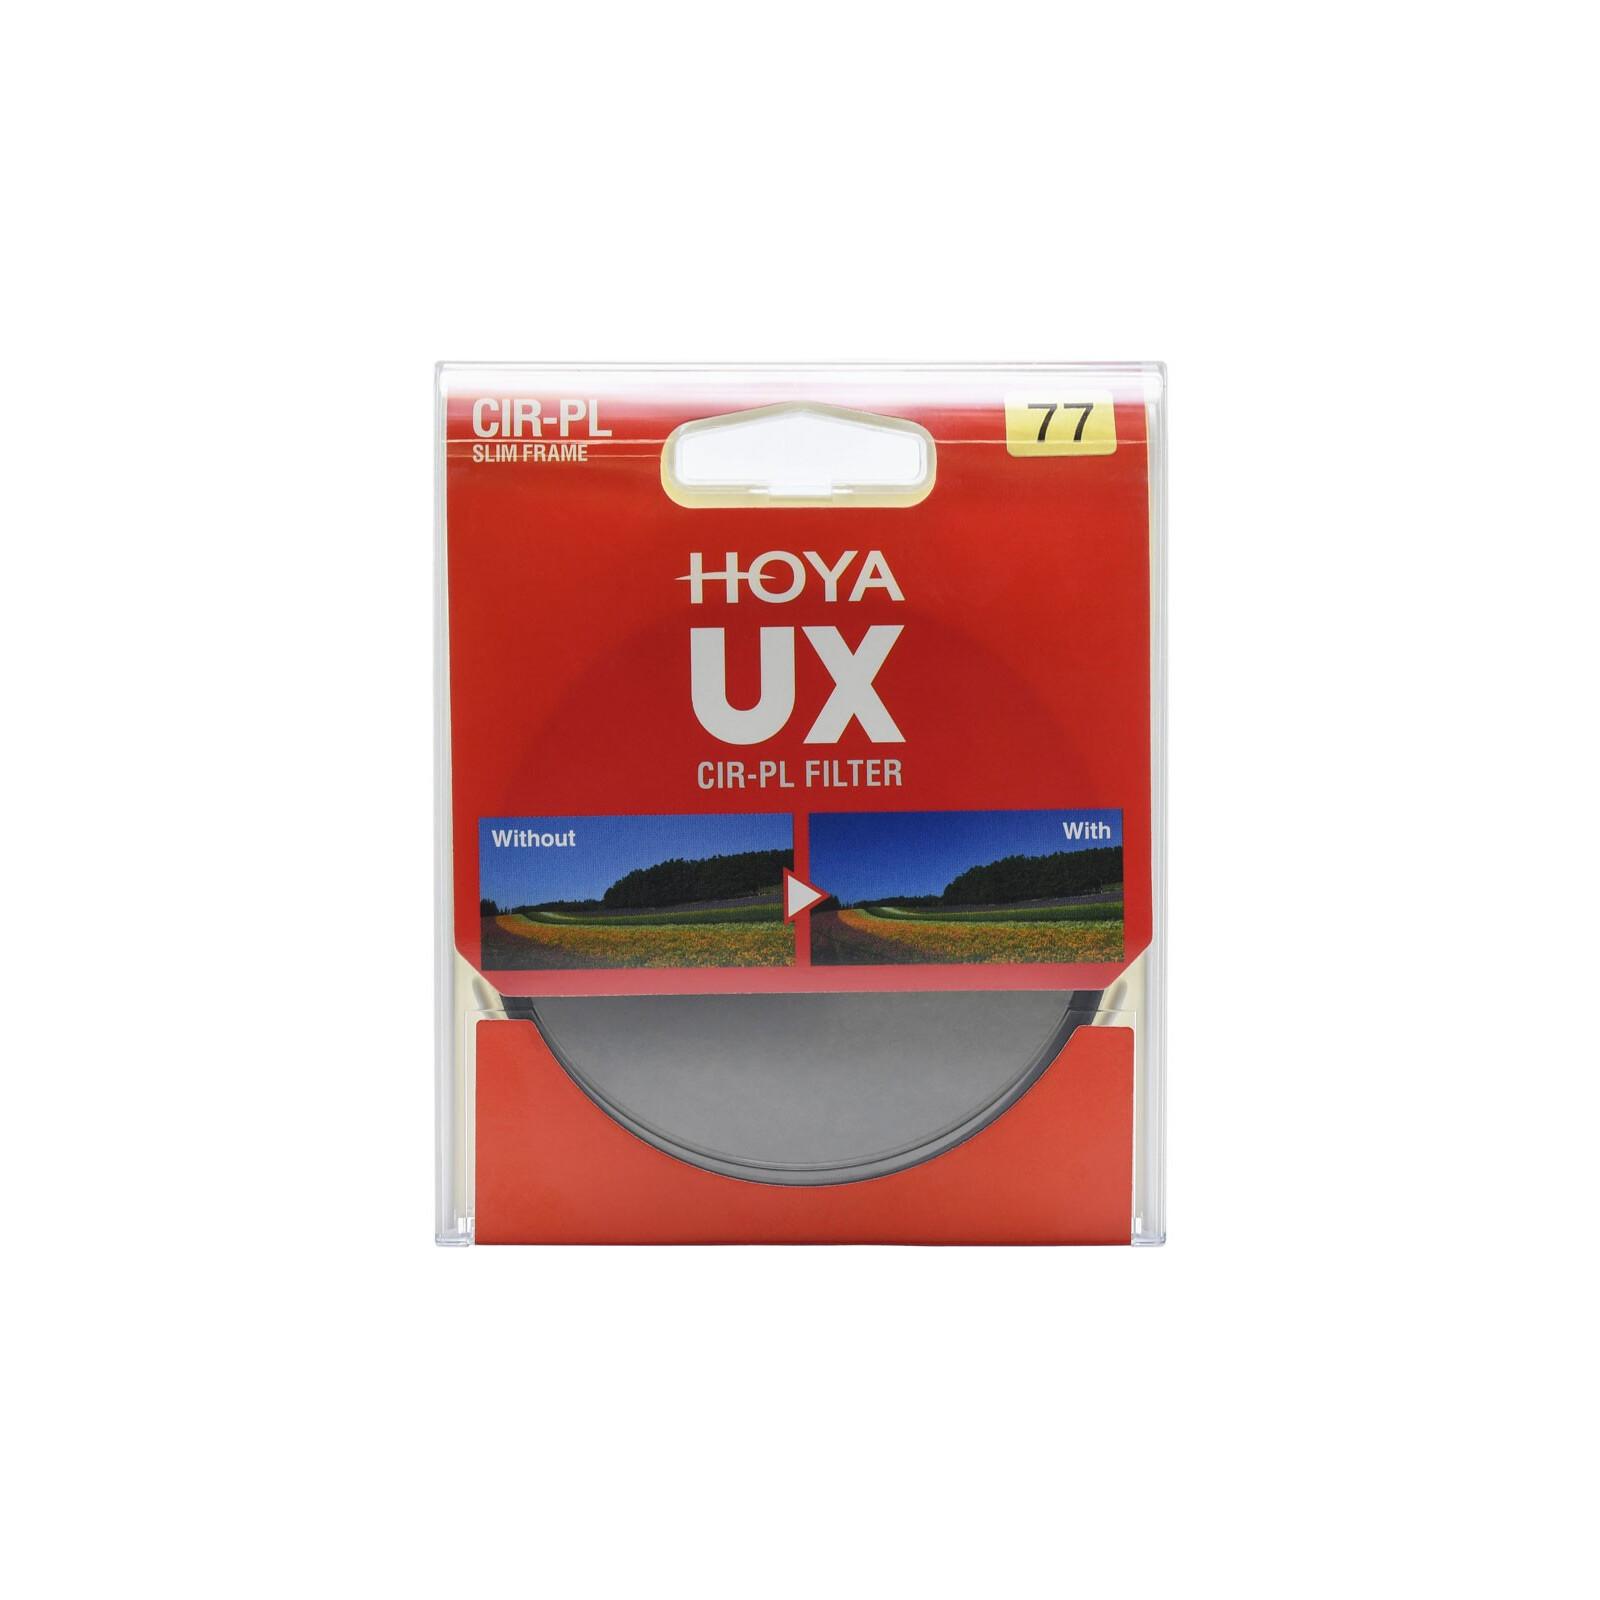 Hoya UX POL CIR